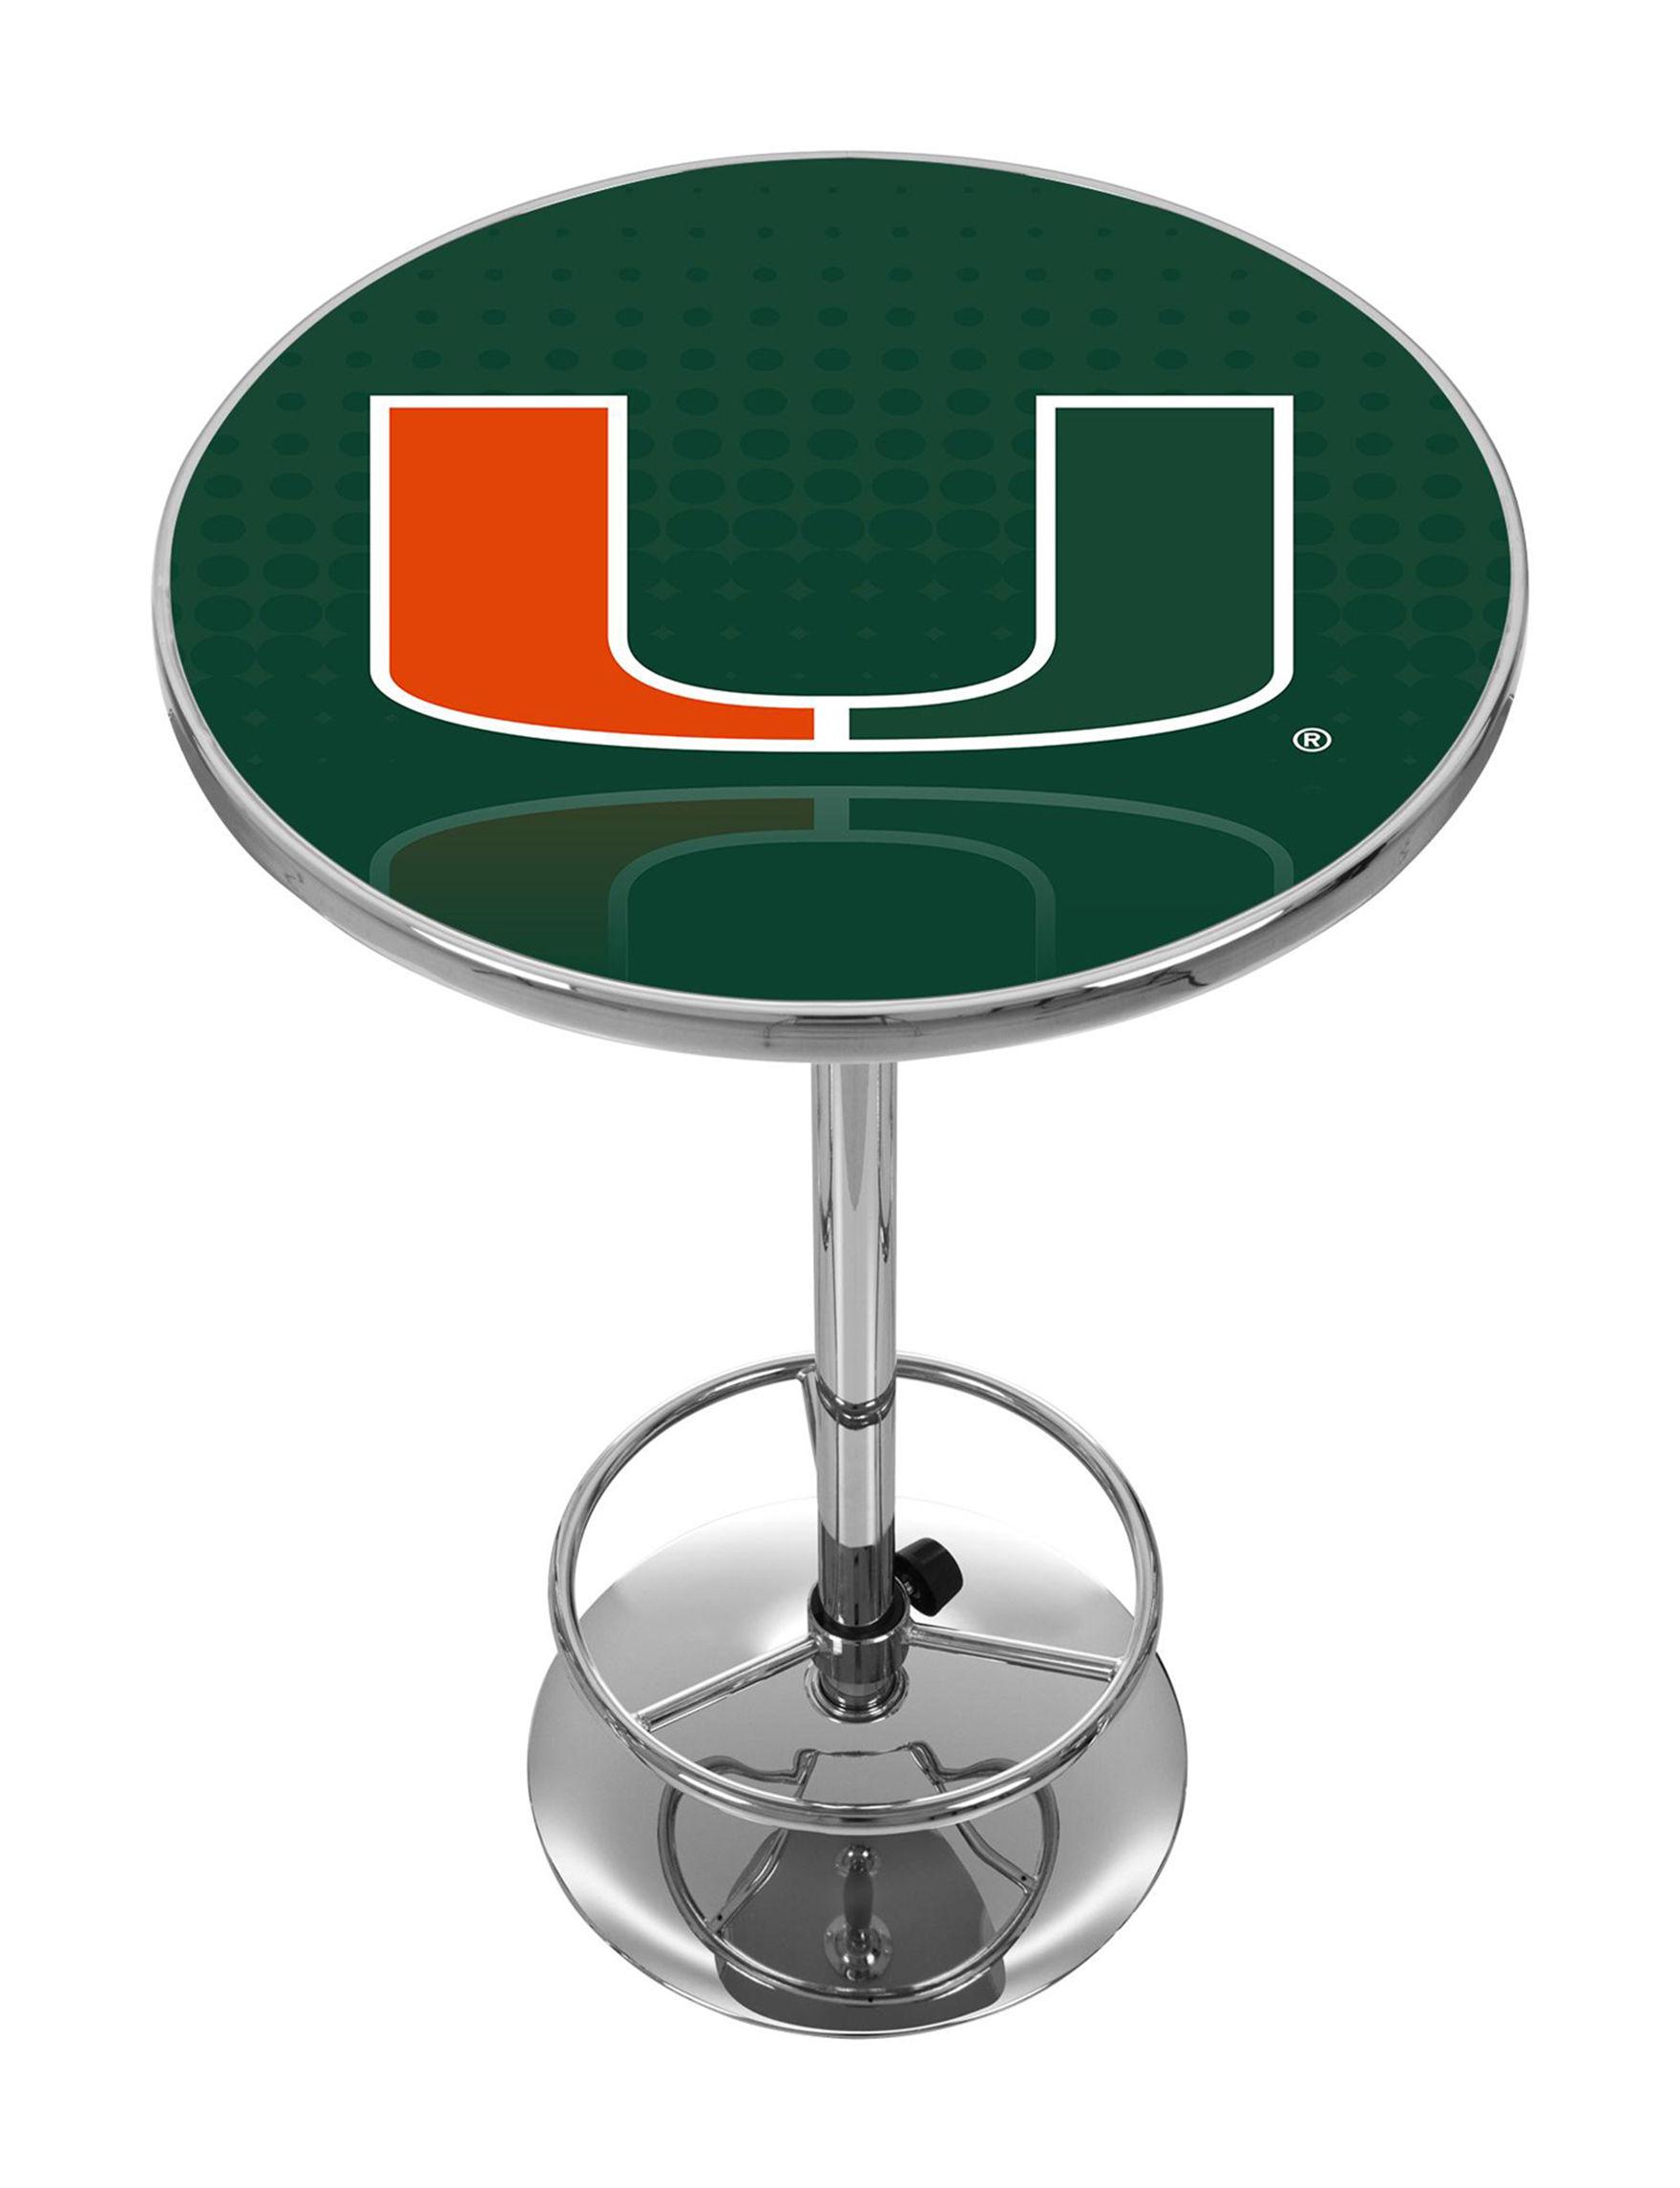 NCAA Orange / Green Dining Tables Kitchen & Dining Furniture NCAA